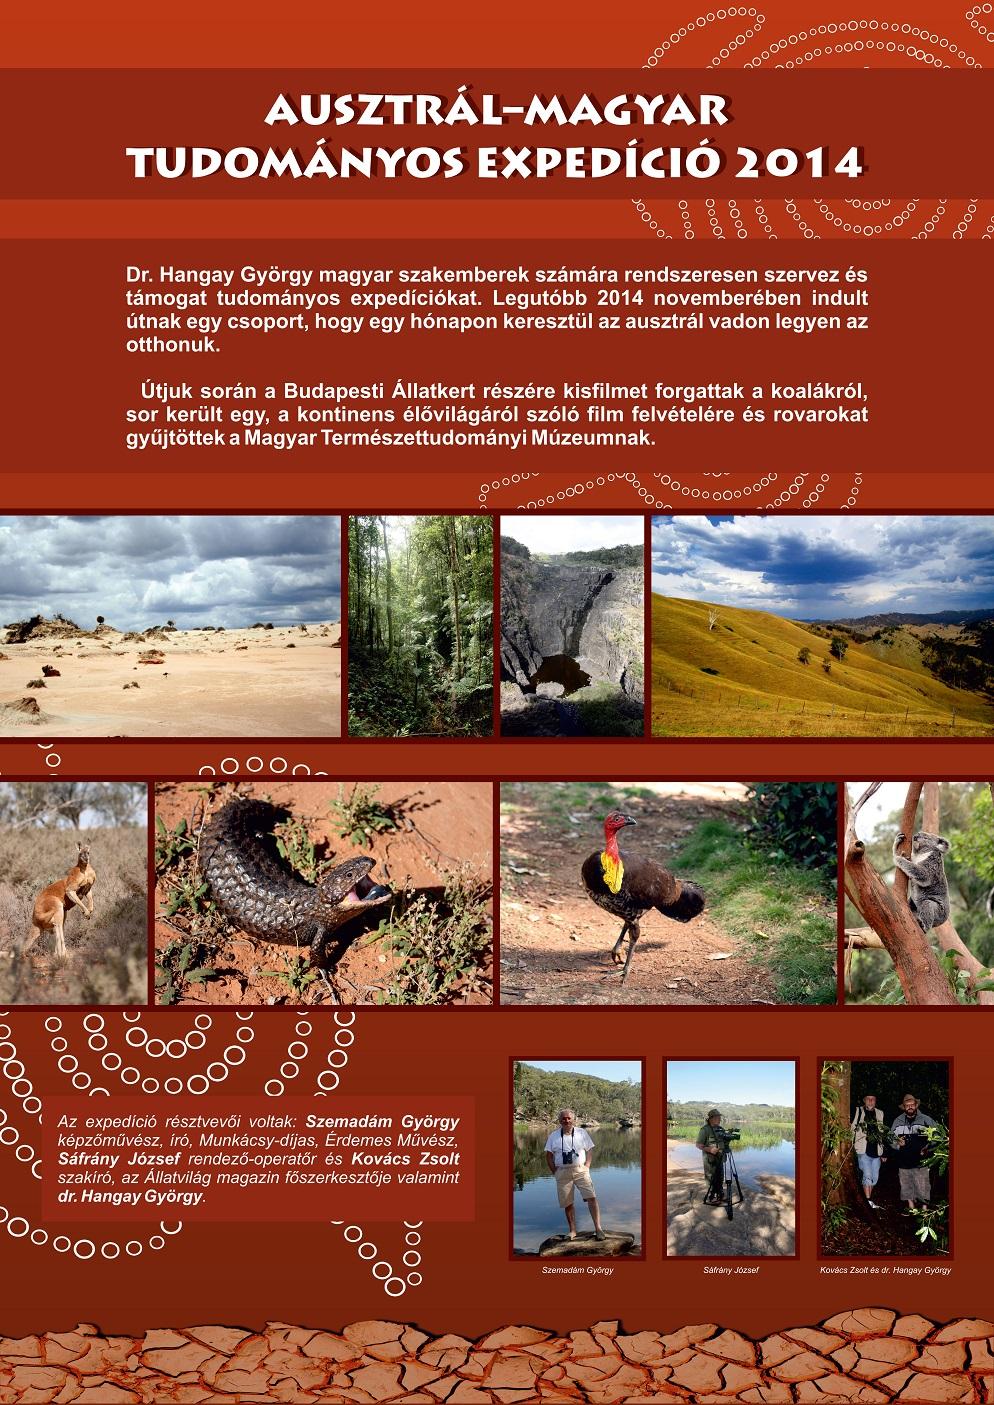 ausztral-magyar tudomanyos expedicio 2014